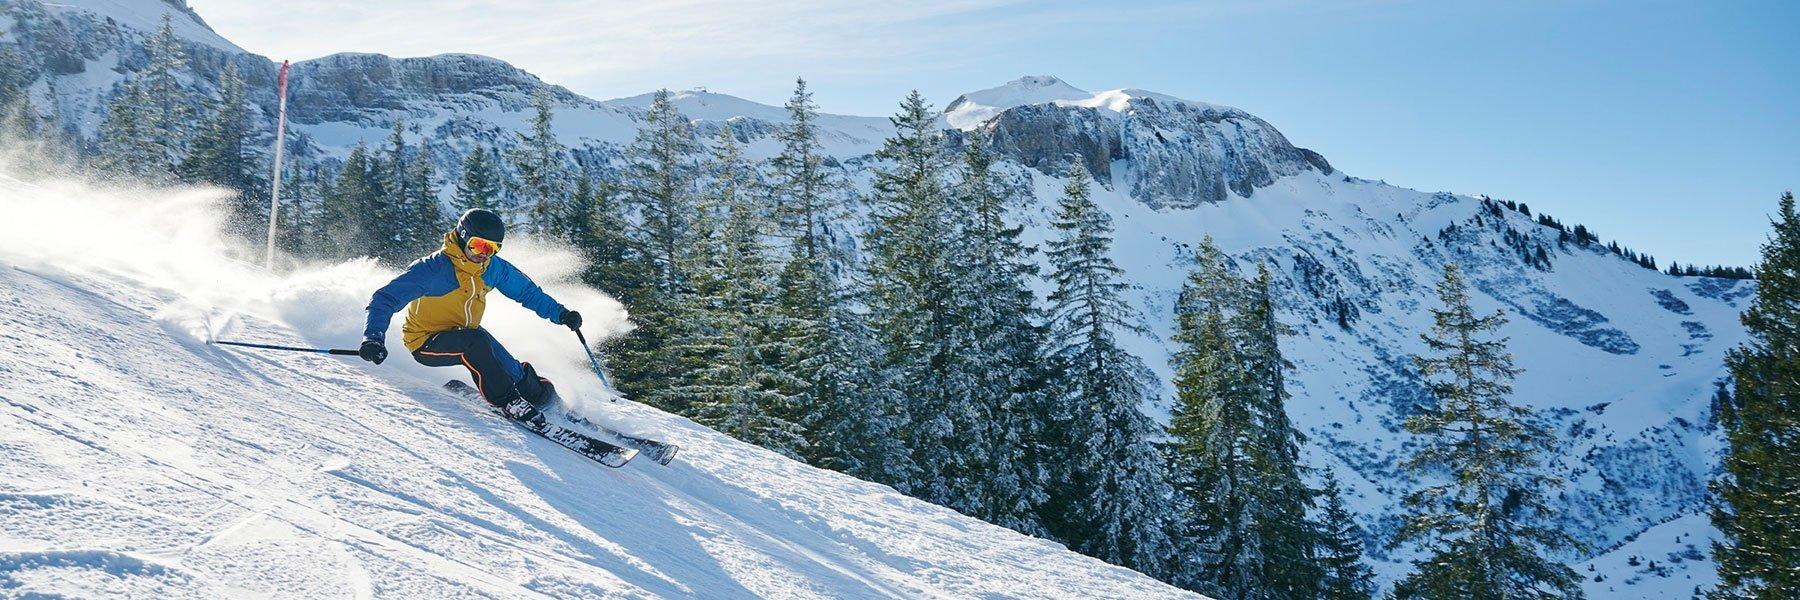 Skiurlaub im Skigebiet Damüls-Mellau